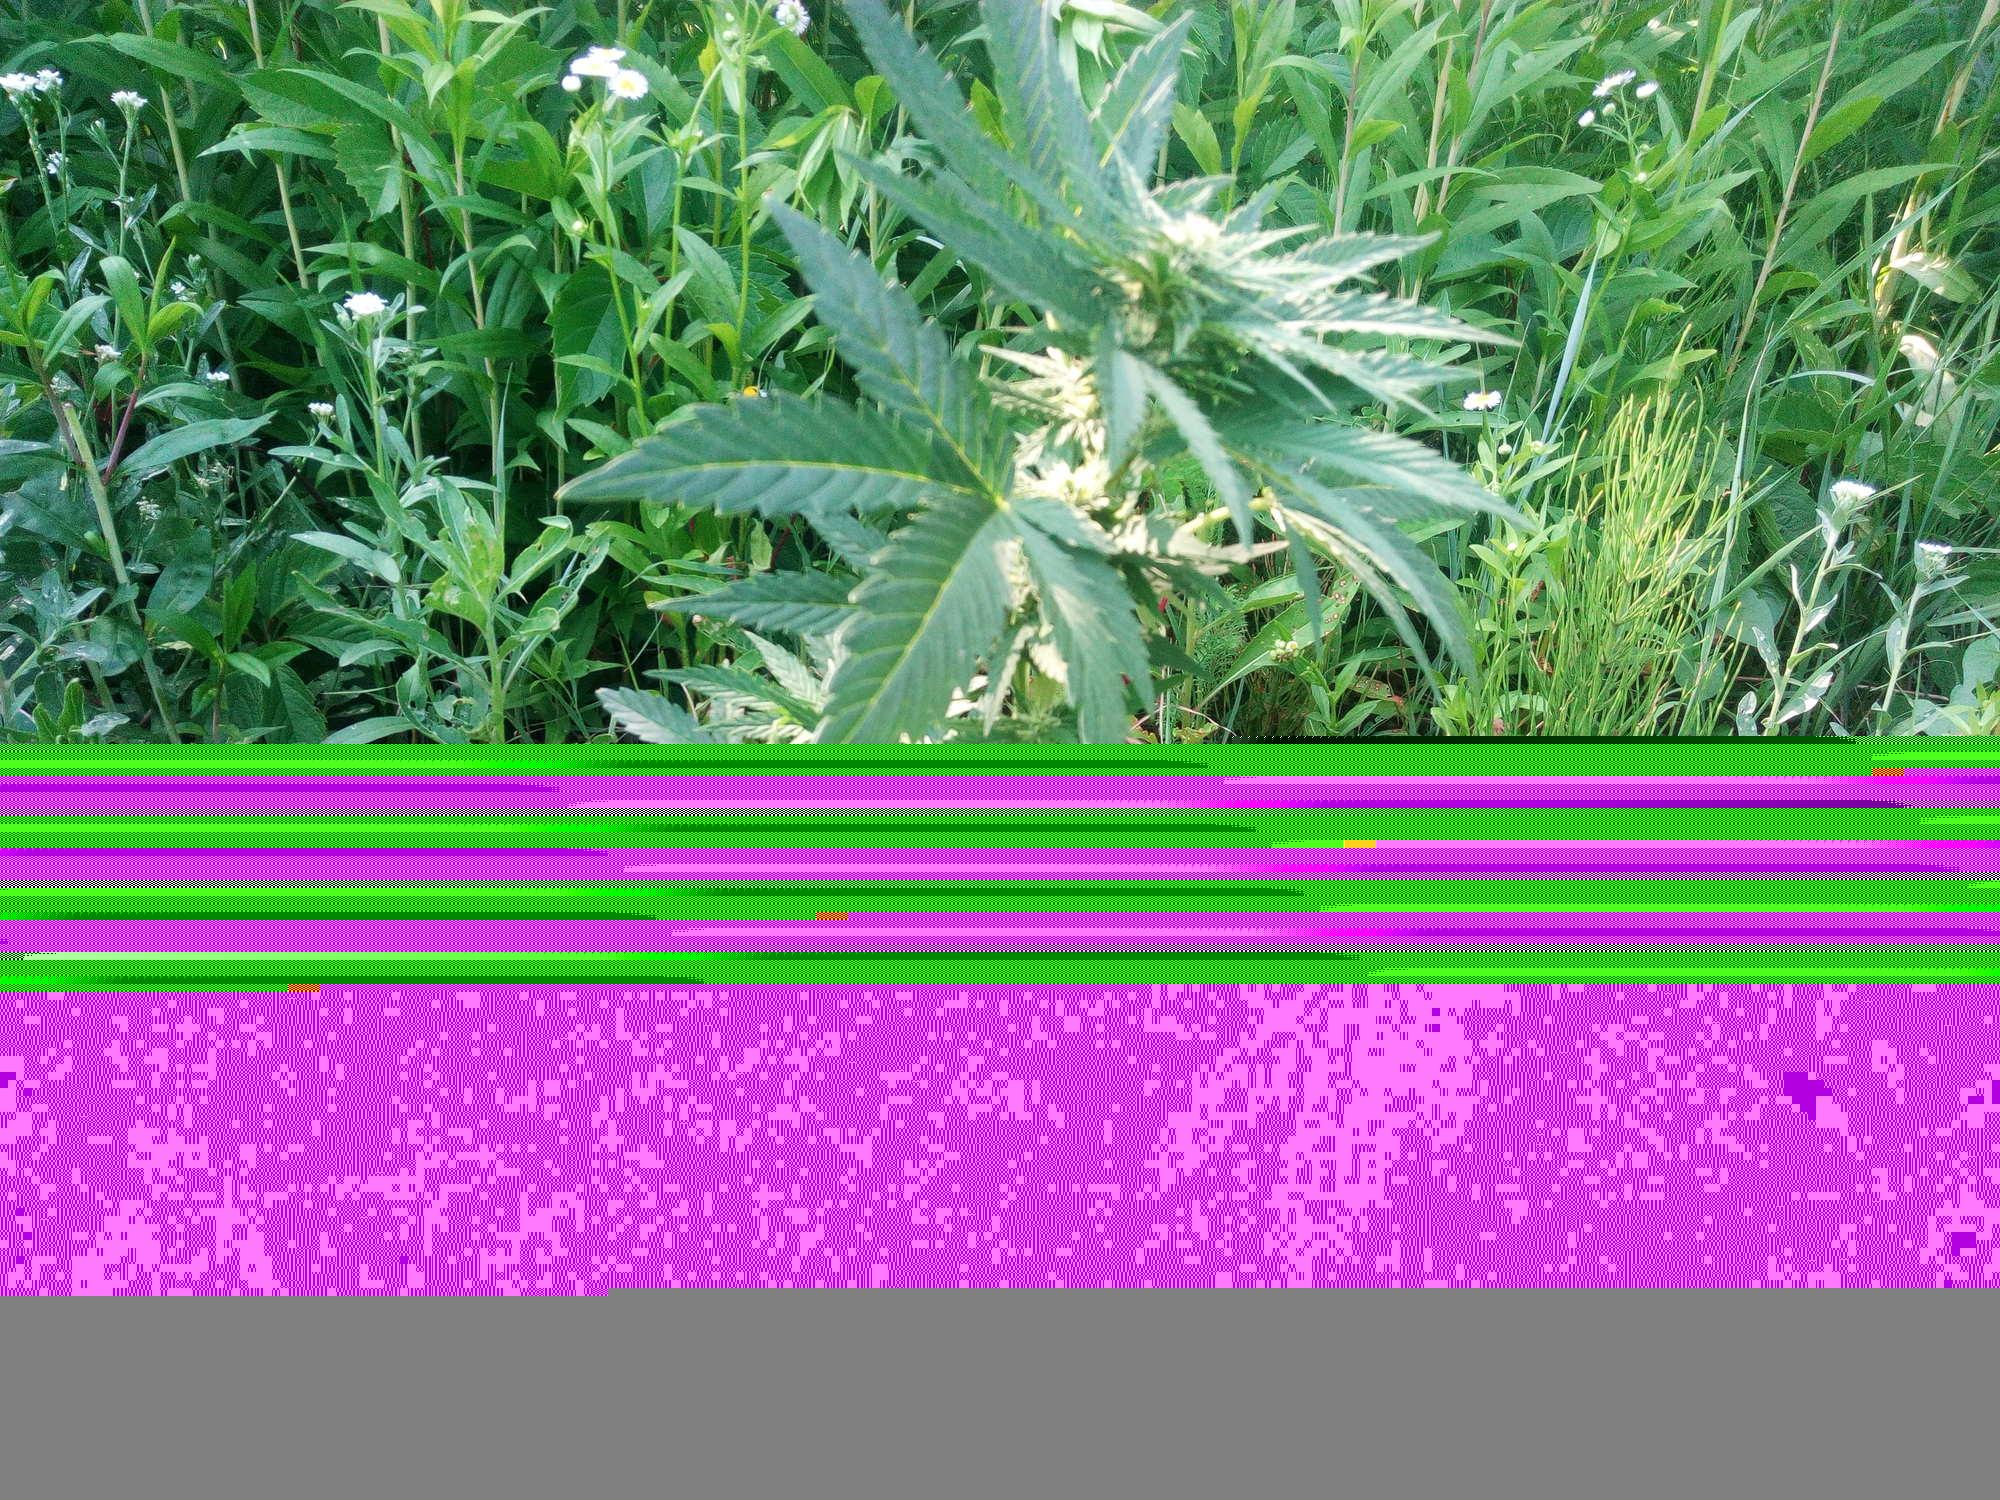 Kali Mist (ES) 8й день цвета..jpg